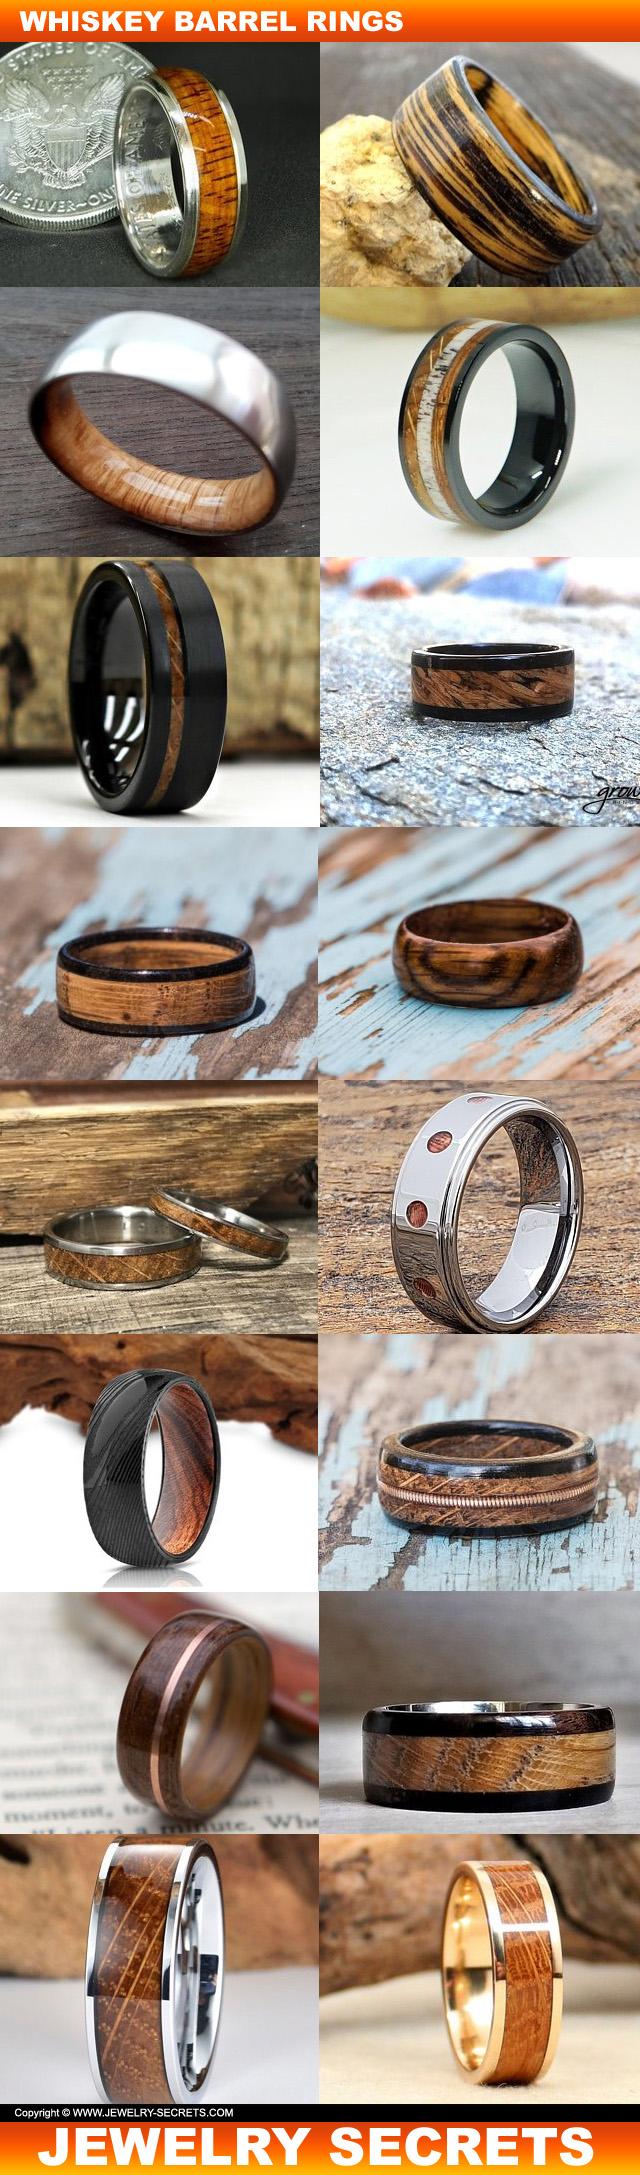 Whiskey Barrel Rings